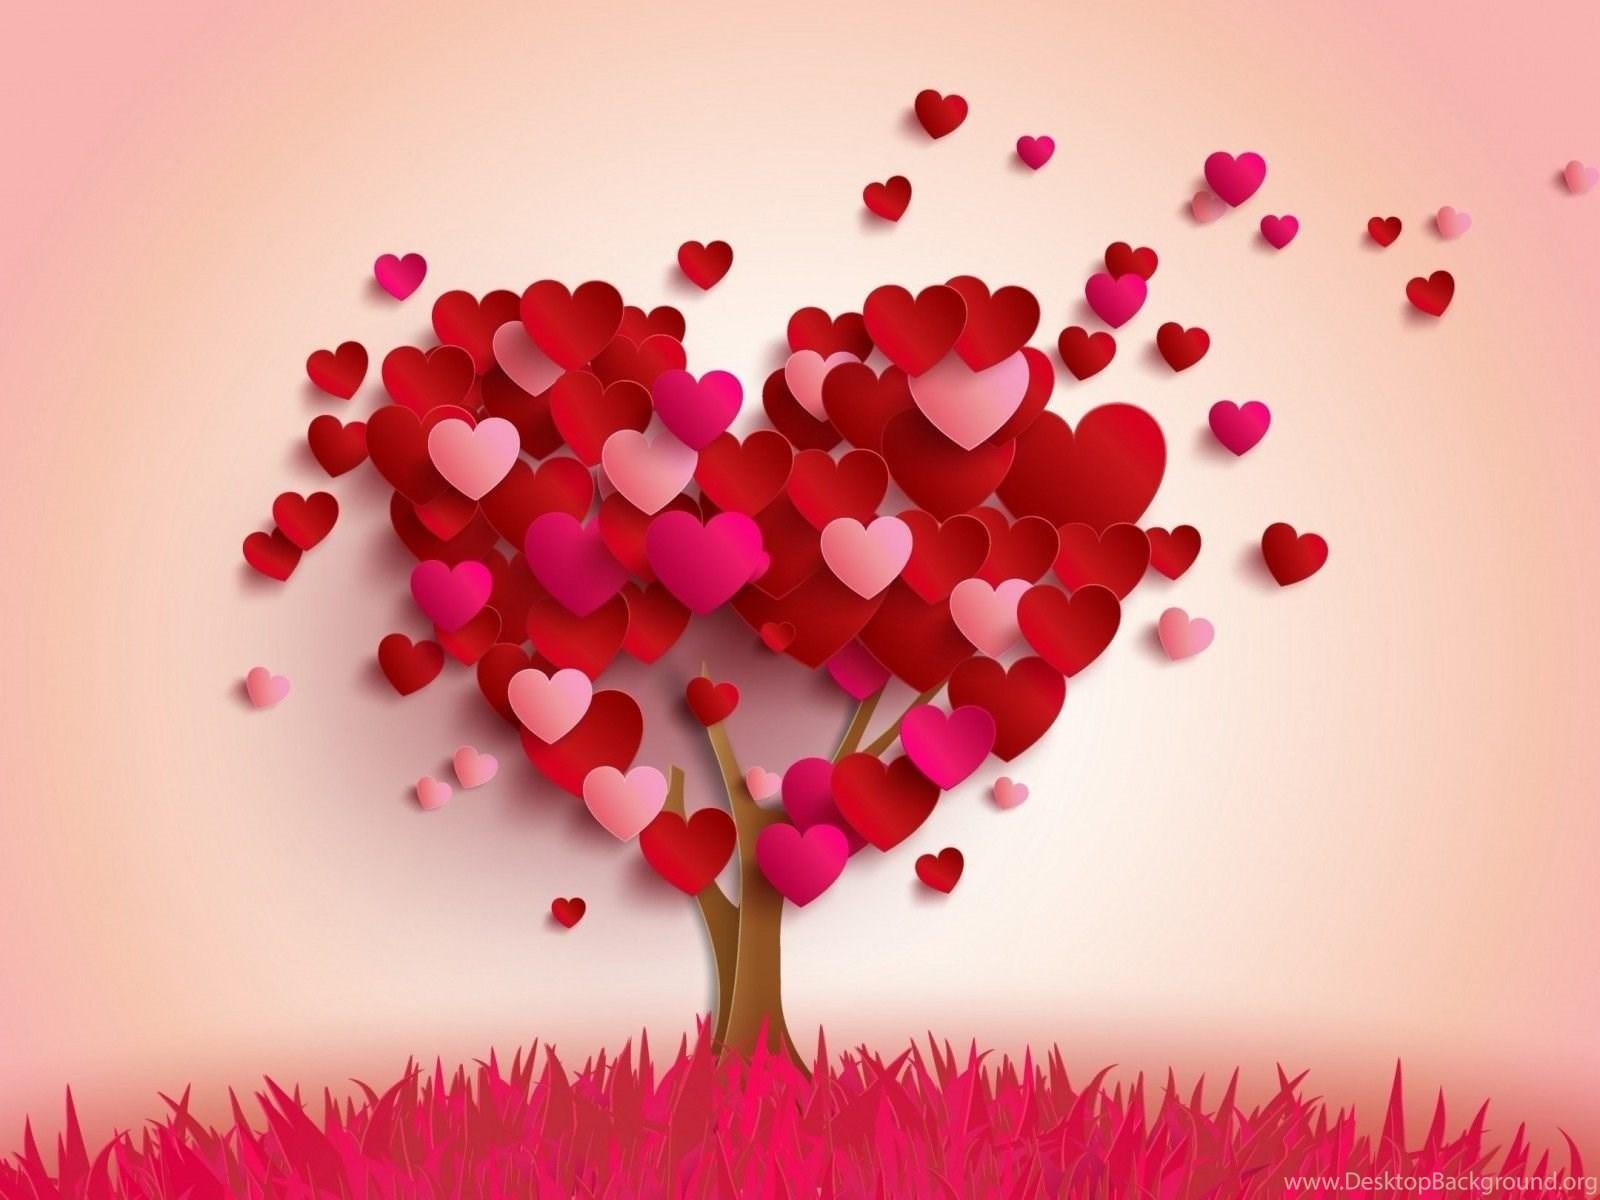 Free Cute Love Wallpapers: Cute Wallpaper: Love Desktop Wallpapers Wallpapers HD